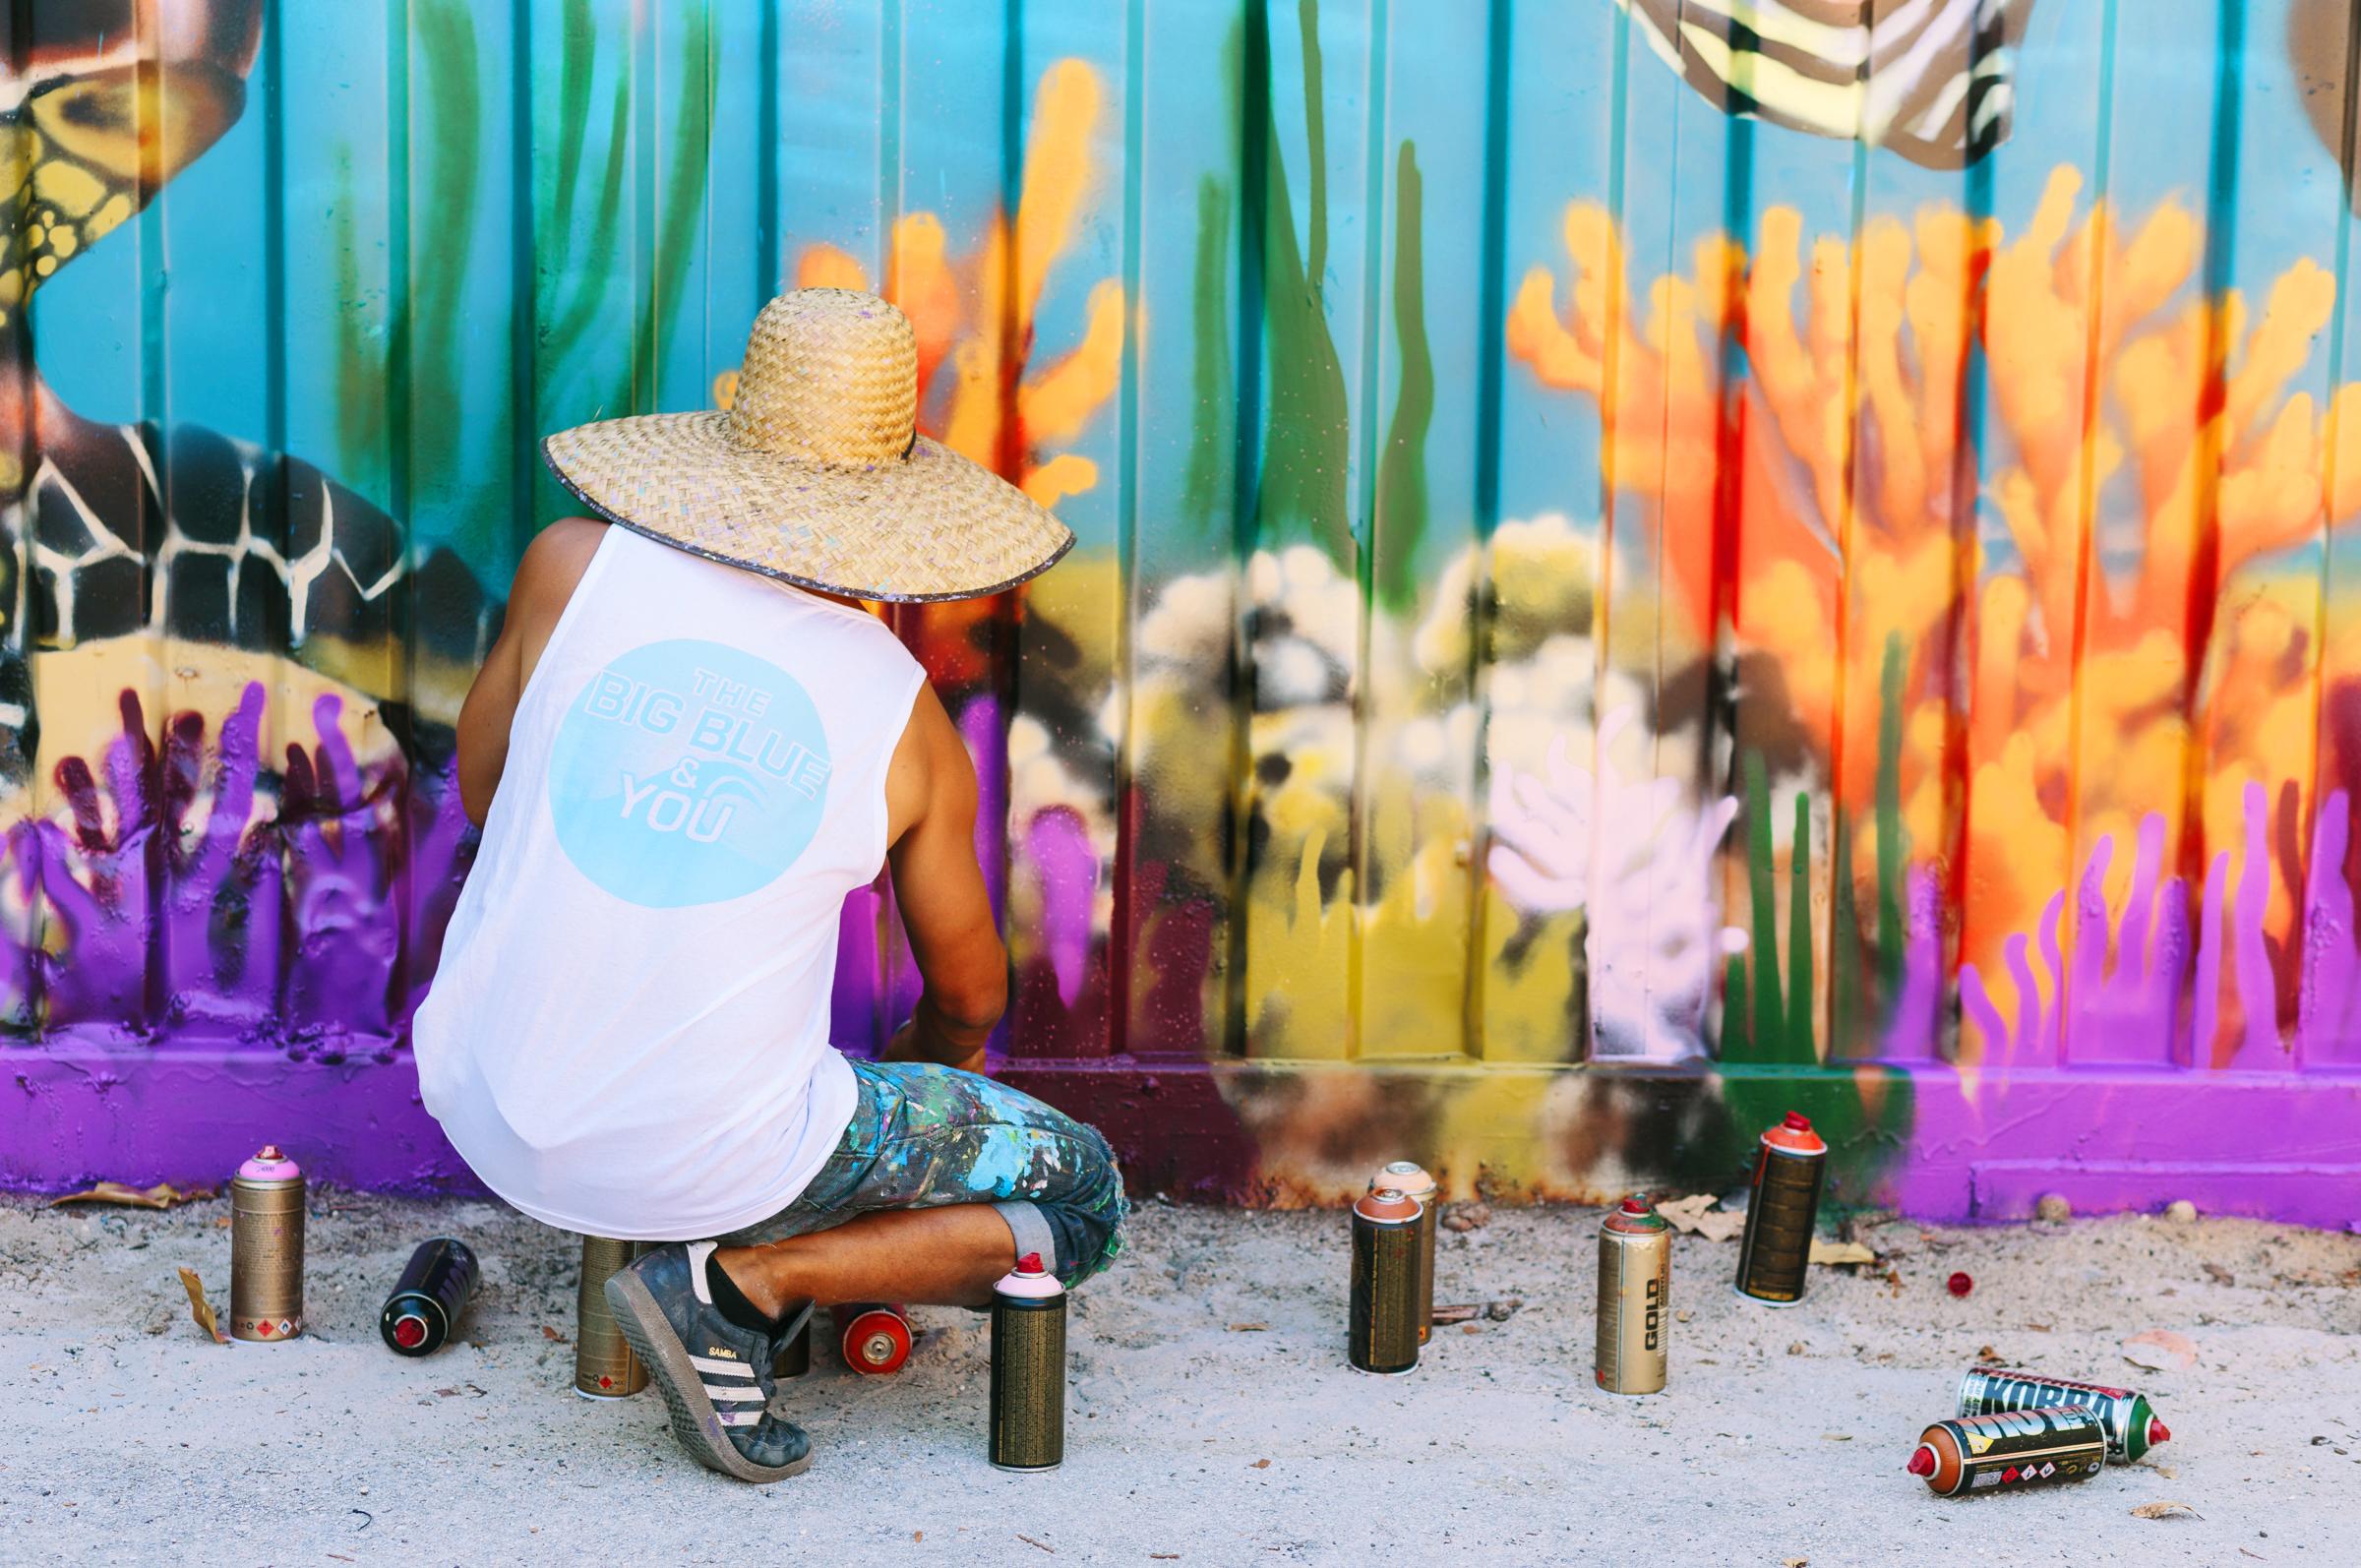 ArtSea-Festival-4-Big-Blue-and-You.jpg